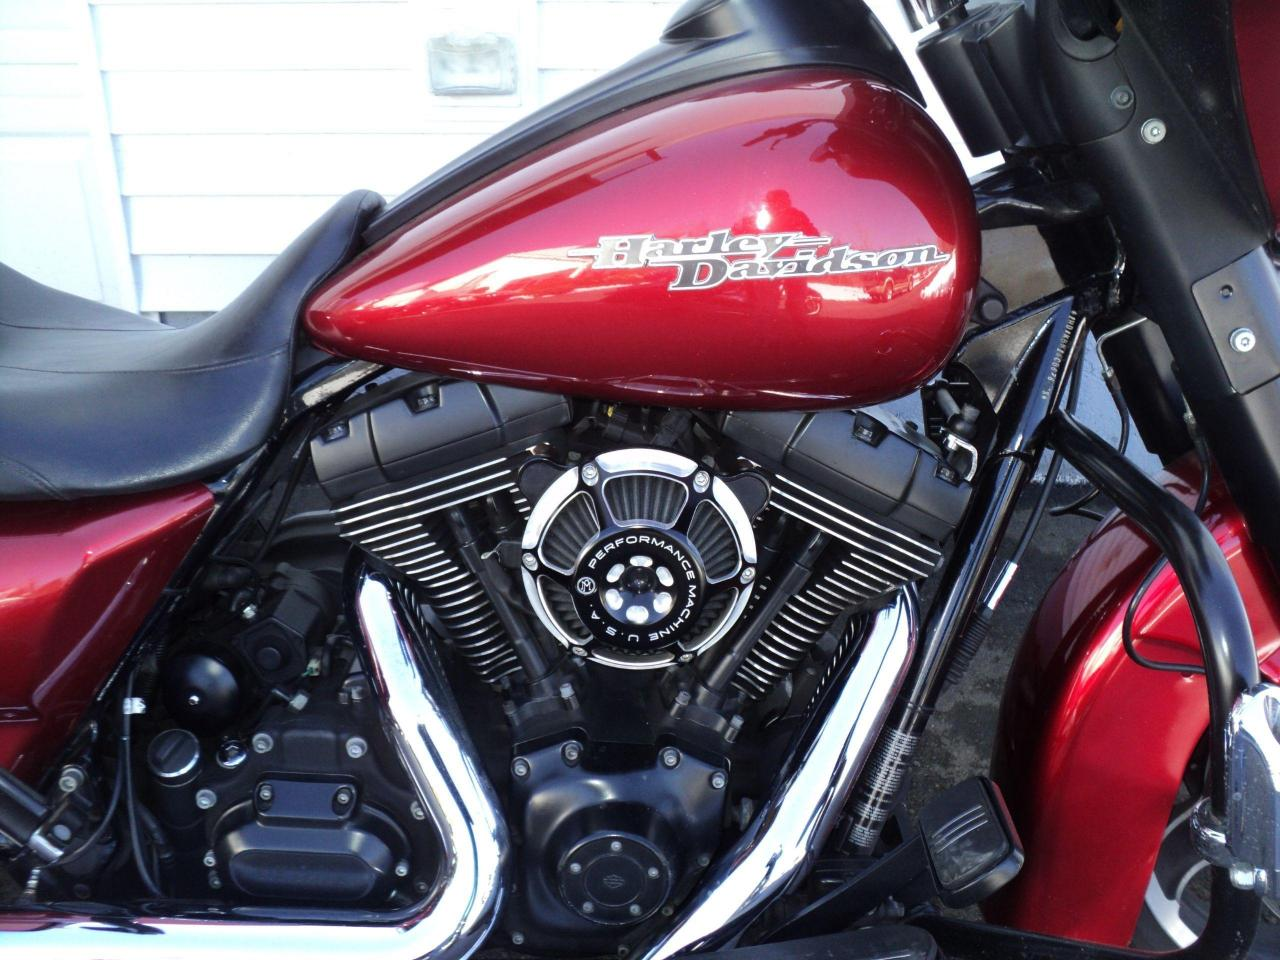 2012 Harley-Davidson Super Glide Custom